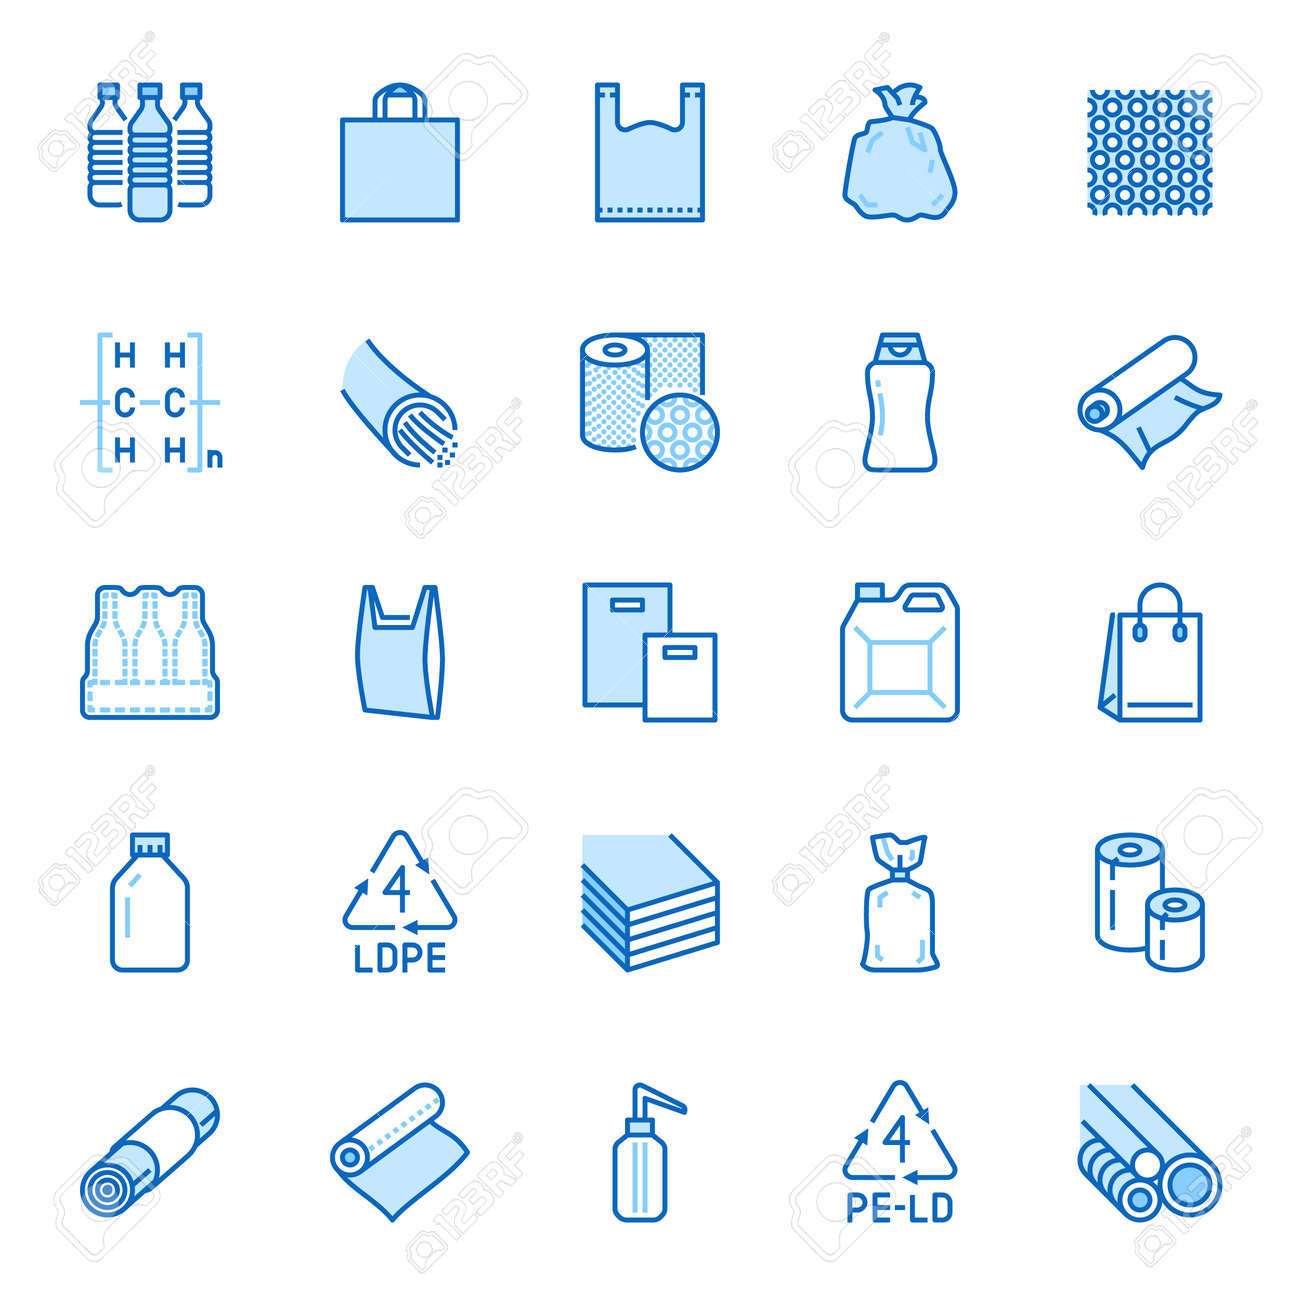 Low density polyethylene flat line icons. - 163160948